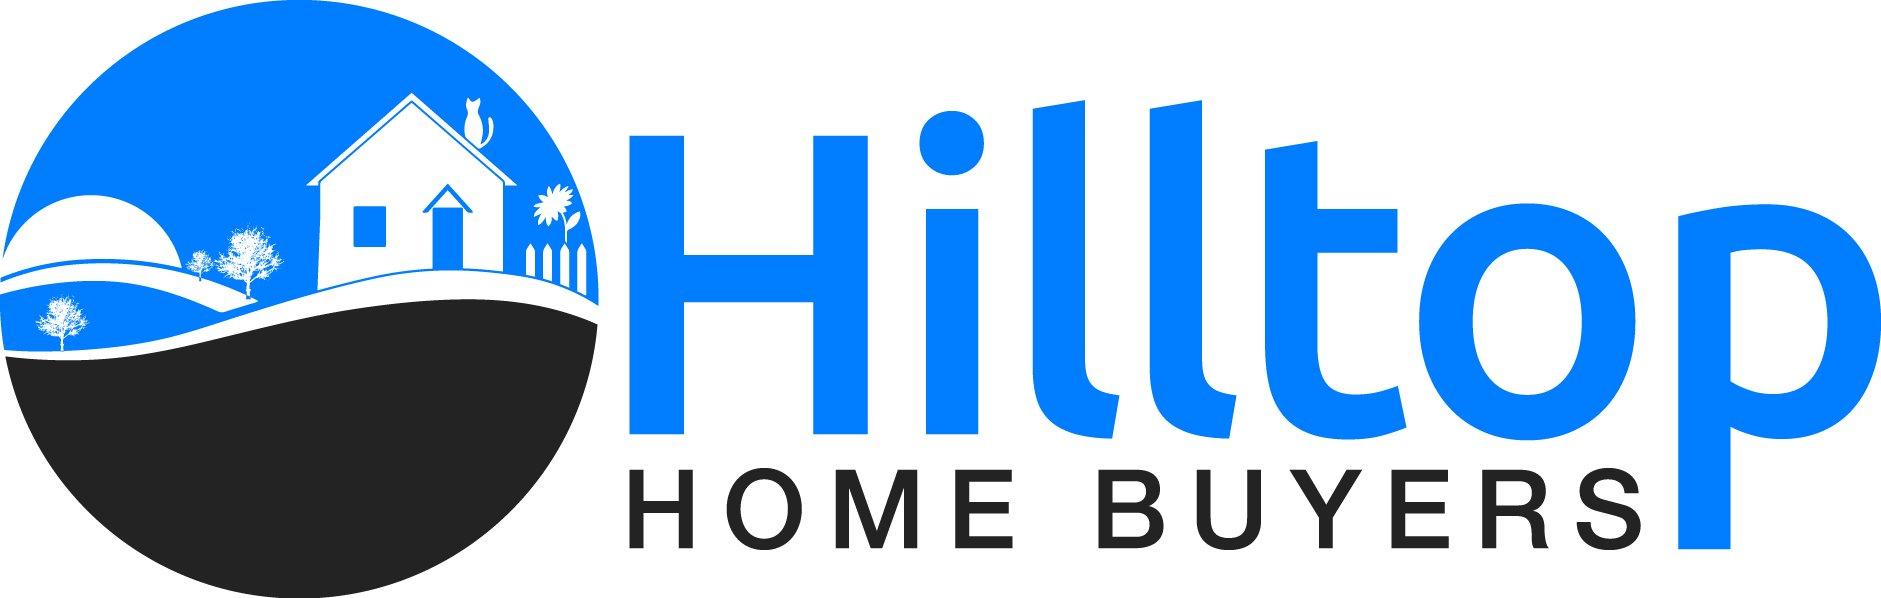 Hilltop Home Buyers logo